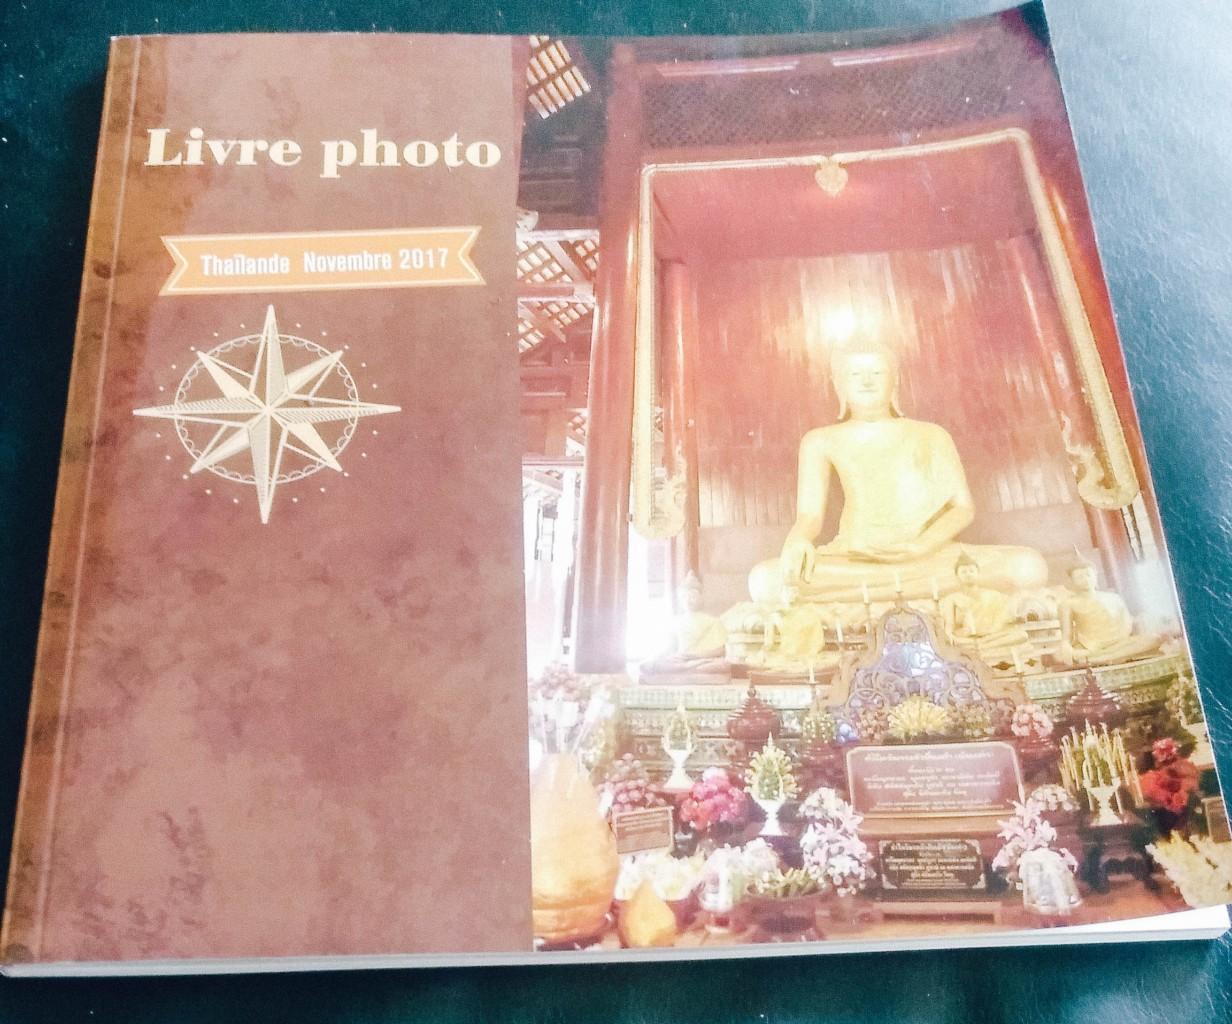 Notre livre Cewe sur notre voyage en Thaïlande